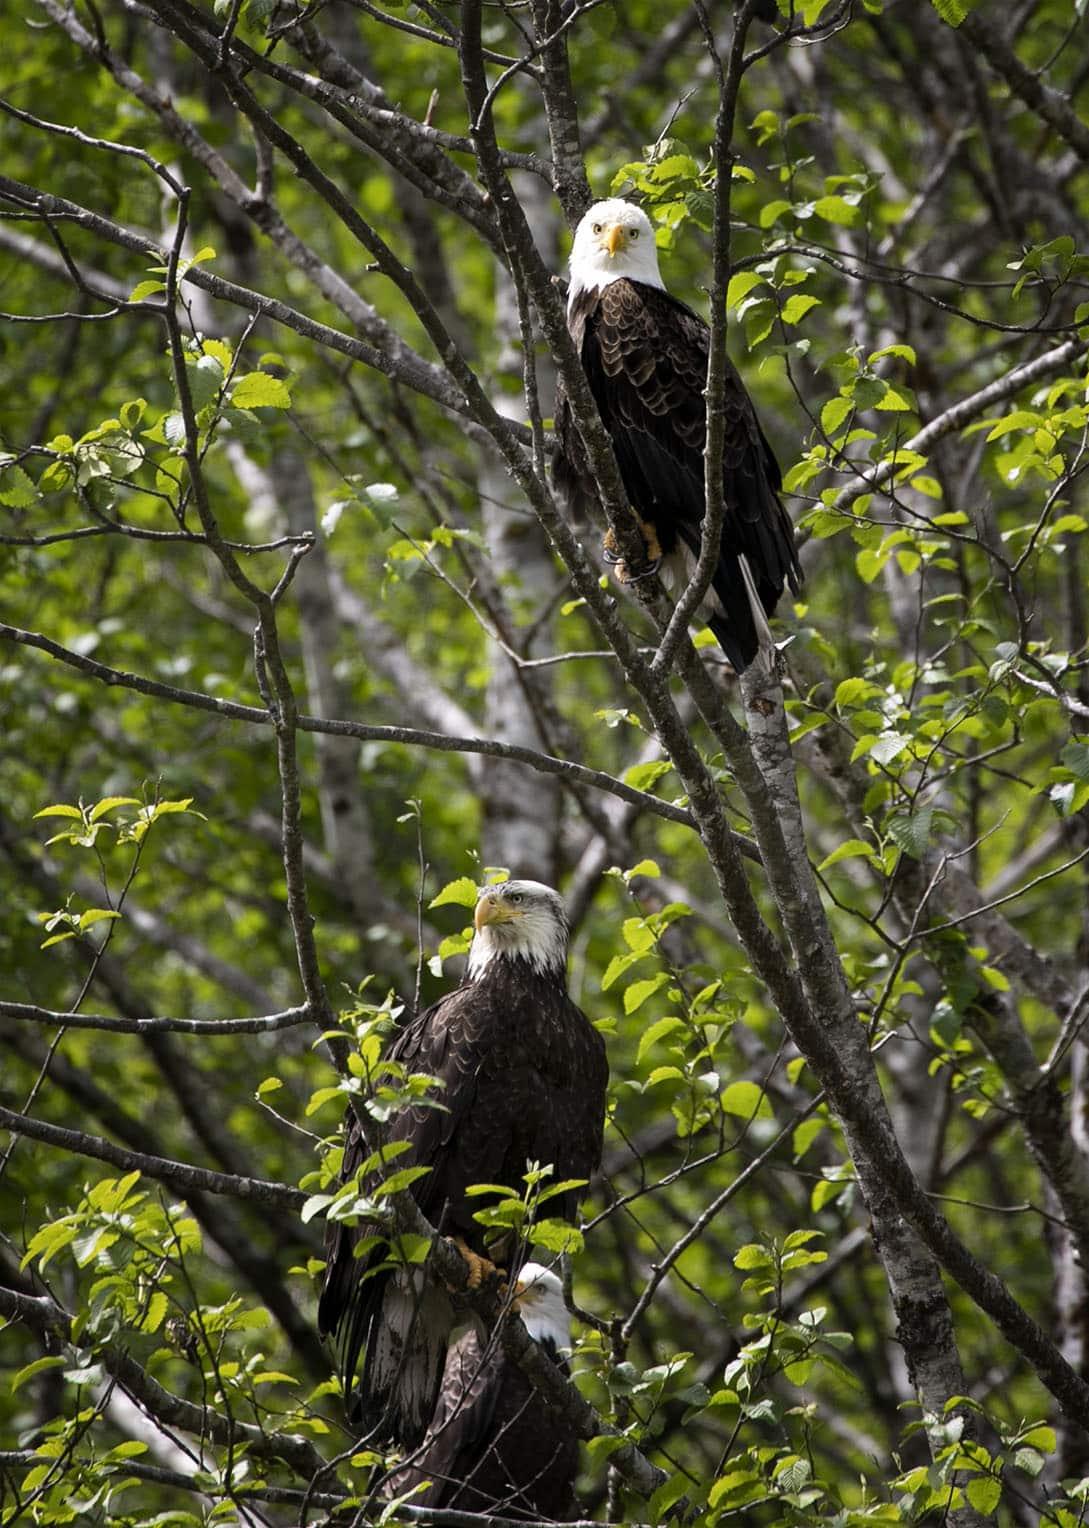 Alaskan Eagle Family in tree captured 70-300mm